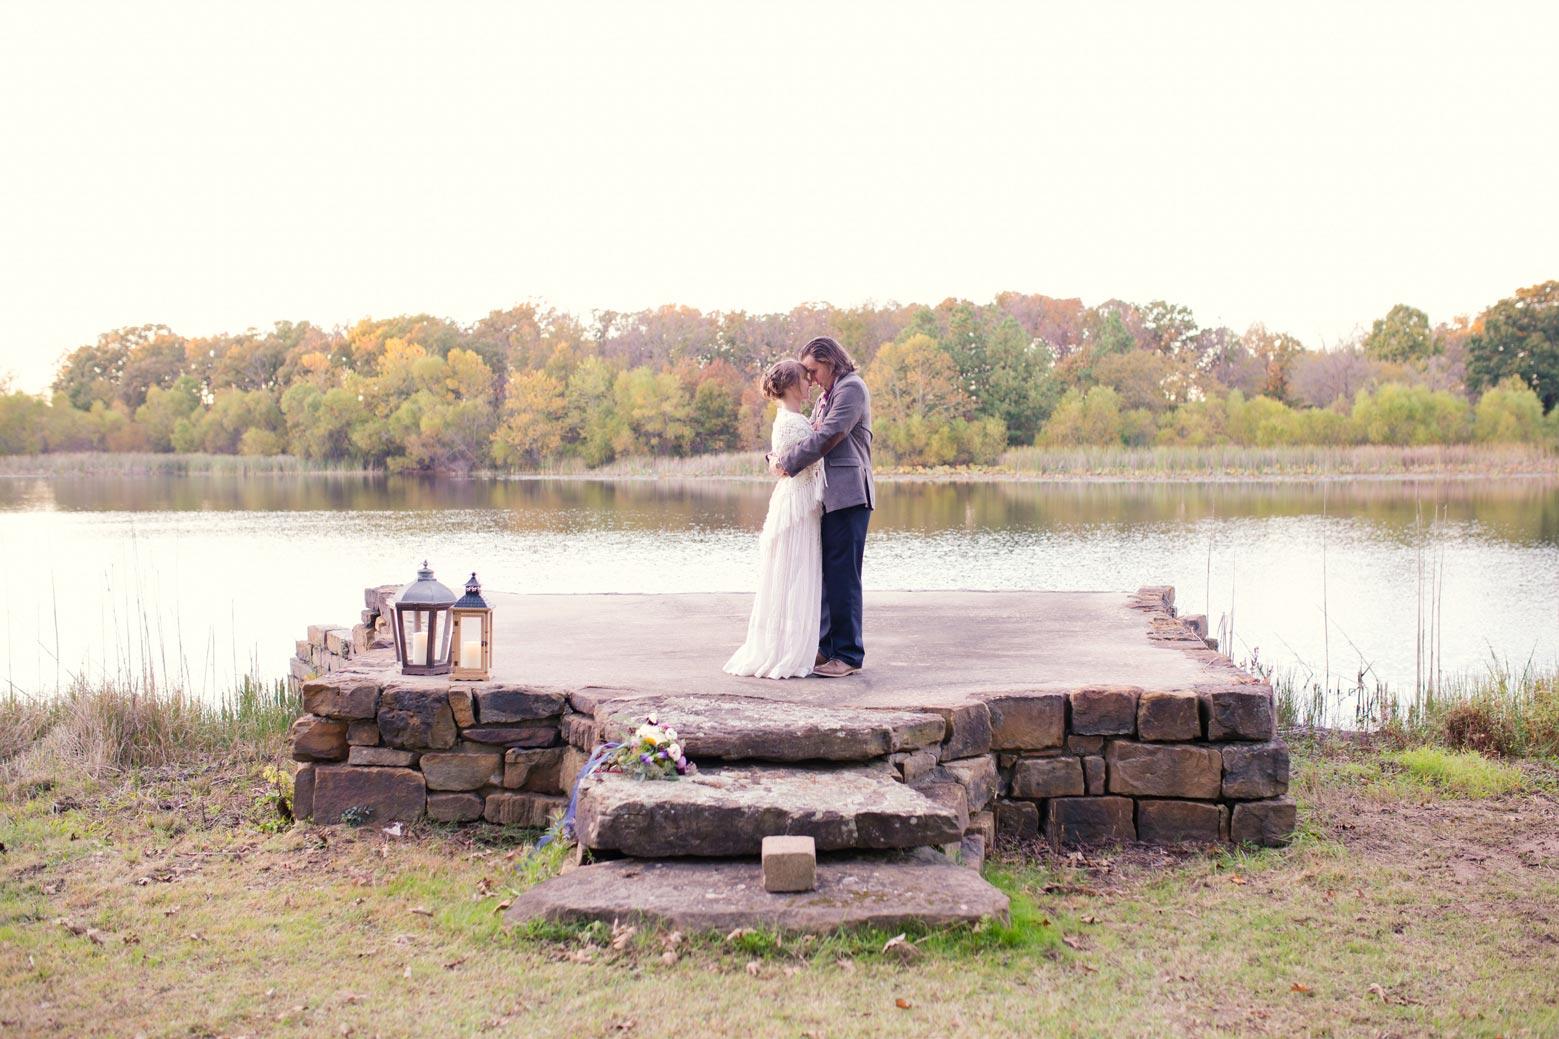 Rustic-Whimsical-Wedding- Tulsa-Wedding-FloristRobyns-Flower-Garden_Mallory-Hall-Photography17.jpg